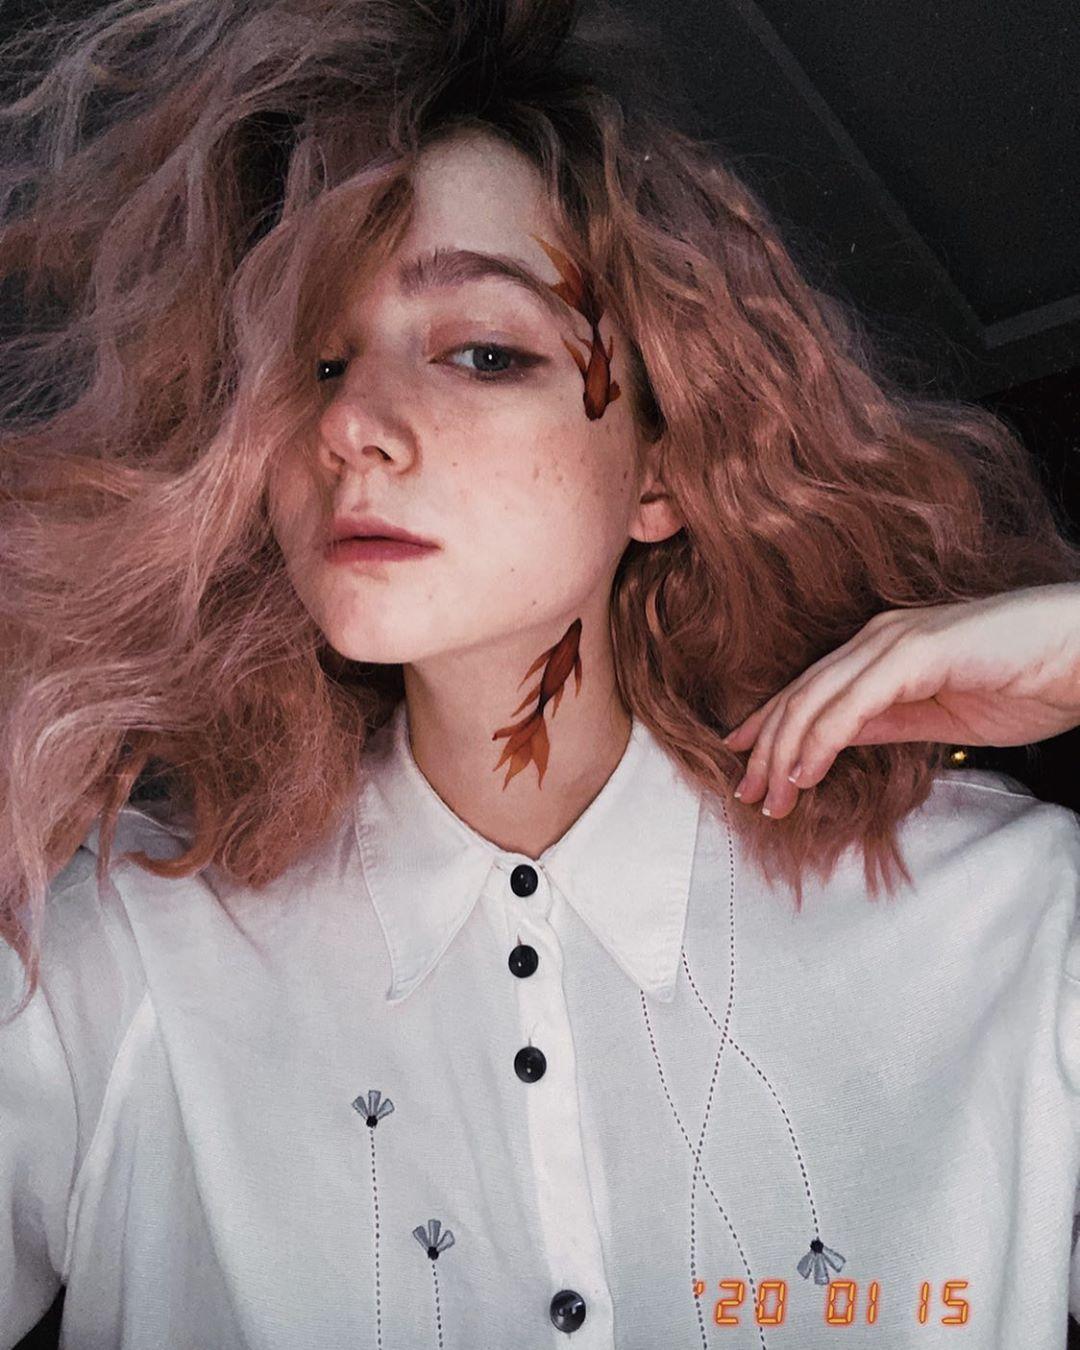 Эвелина Кошкина (Эвелинушка): биография блогерши